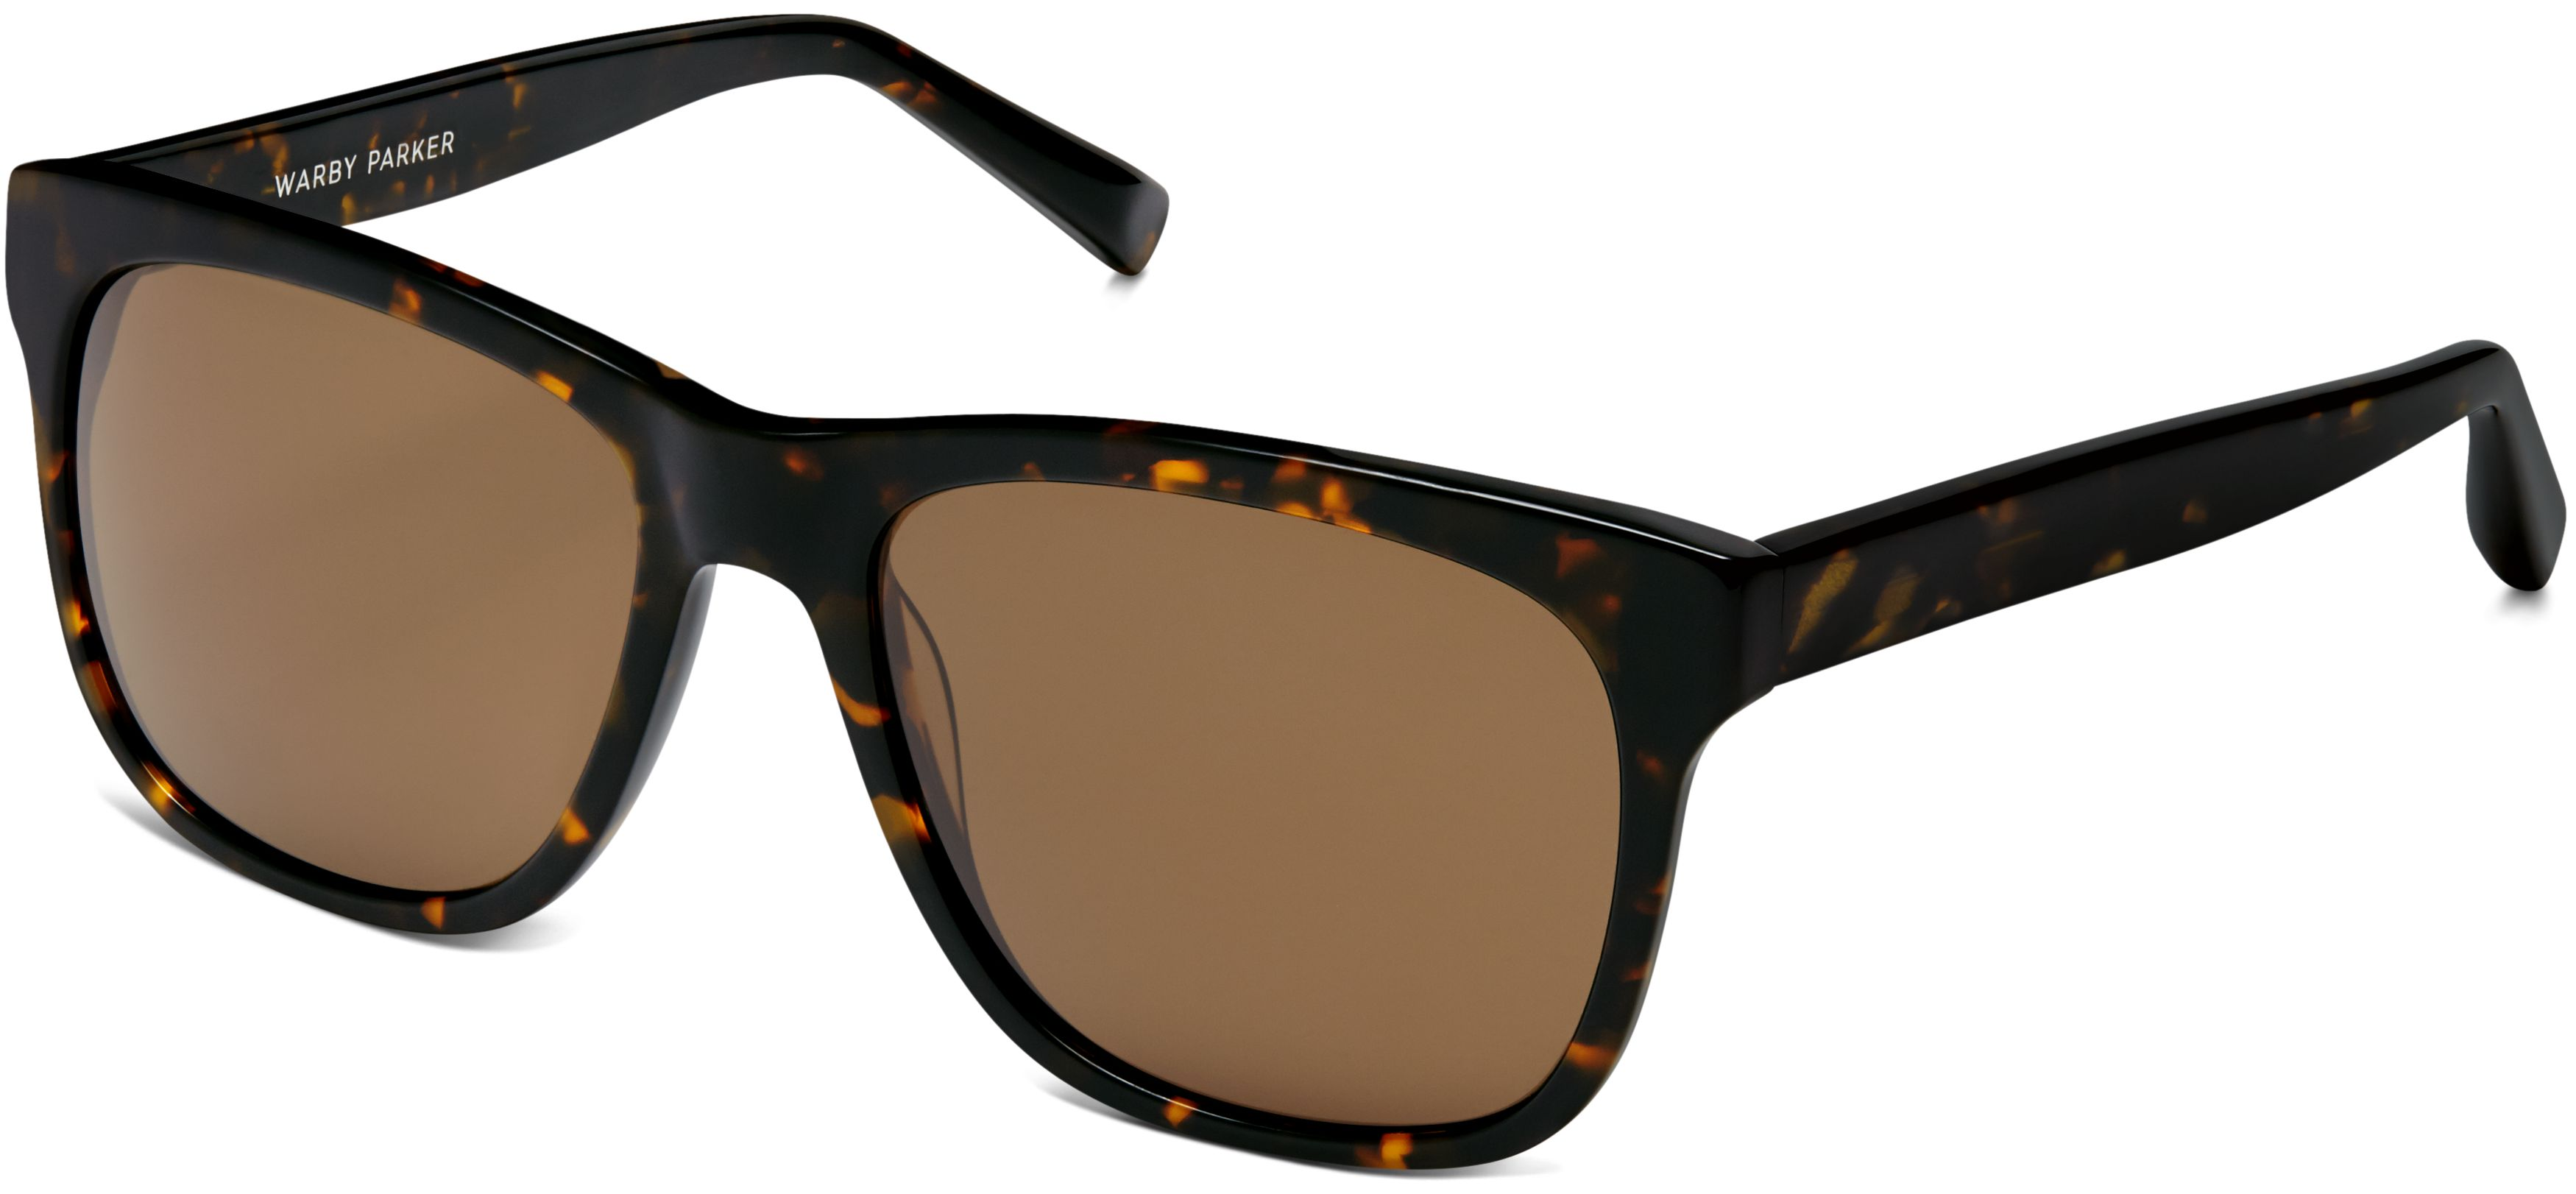 949cc0dc15 Kirkland Polarized Sunglasses « One More Soul